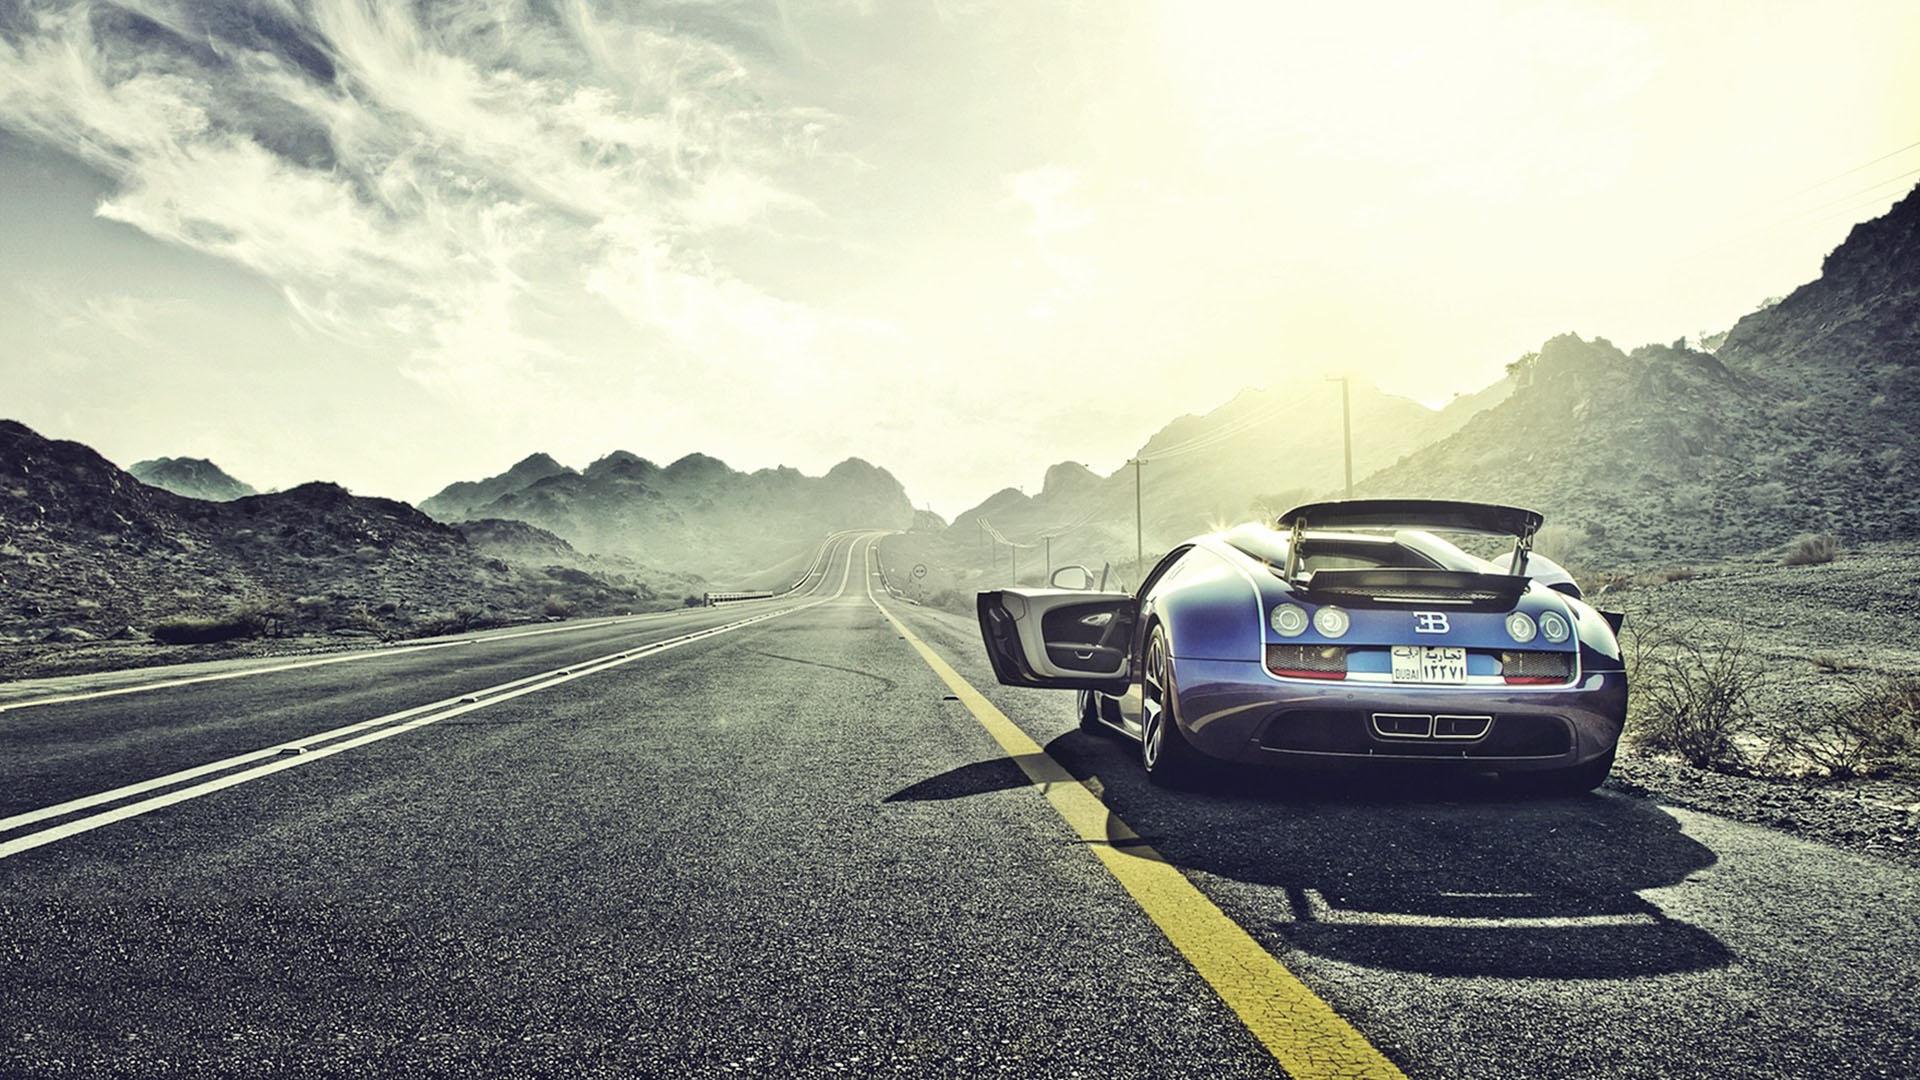 2013-Bugatti-Veyron-16.4-Grand-Sport-Vitesse-1080p-walls Astounding Bugatti Veyron Grand Sport Vitesse Hd Cars Trend